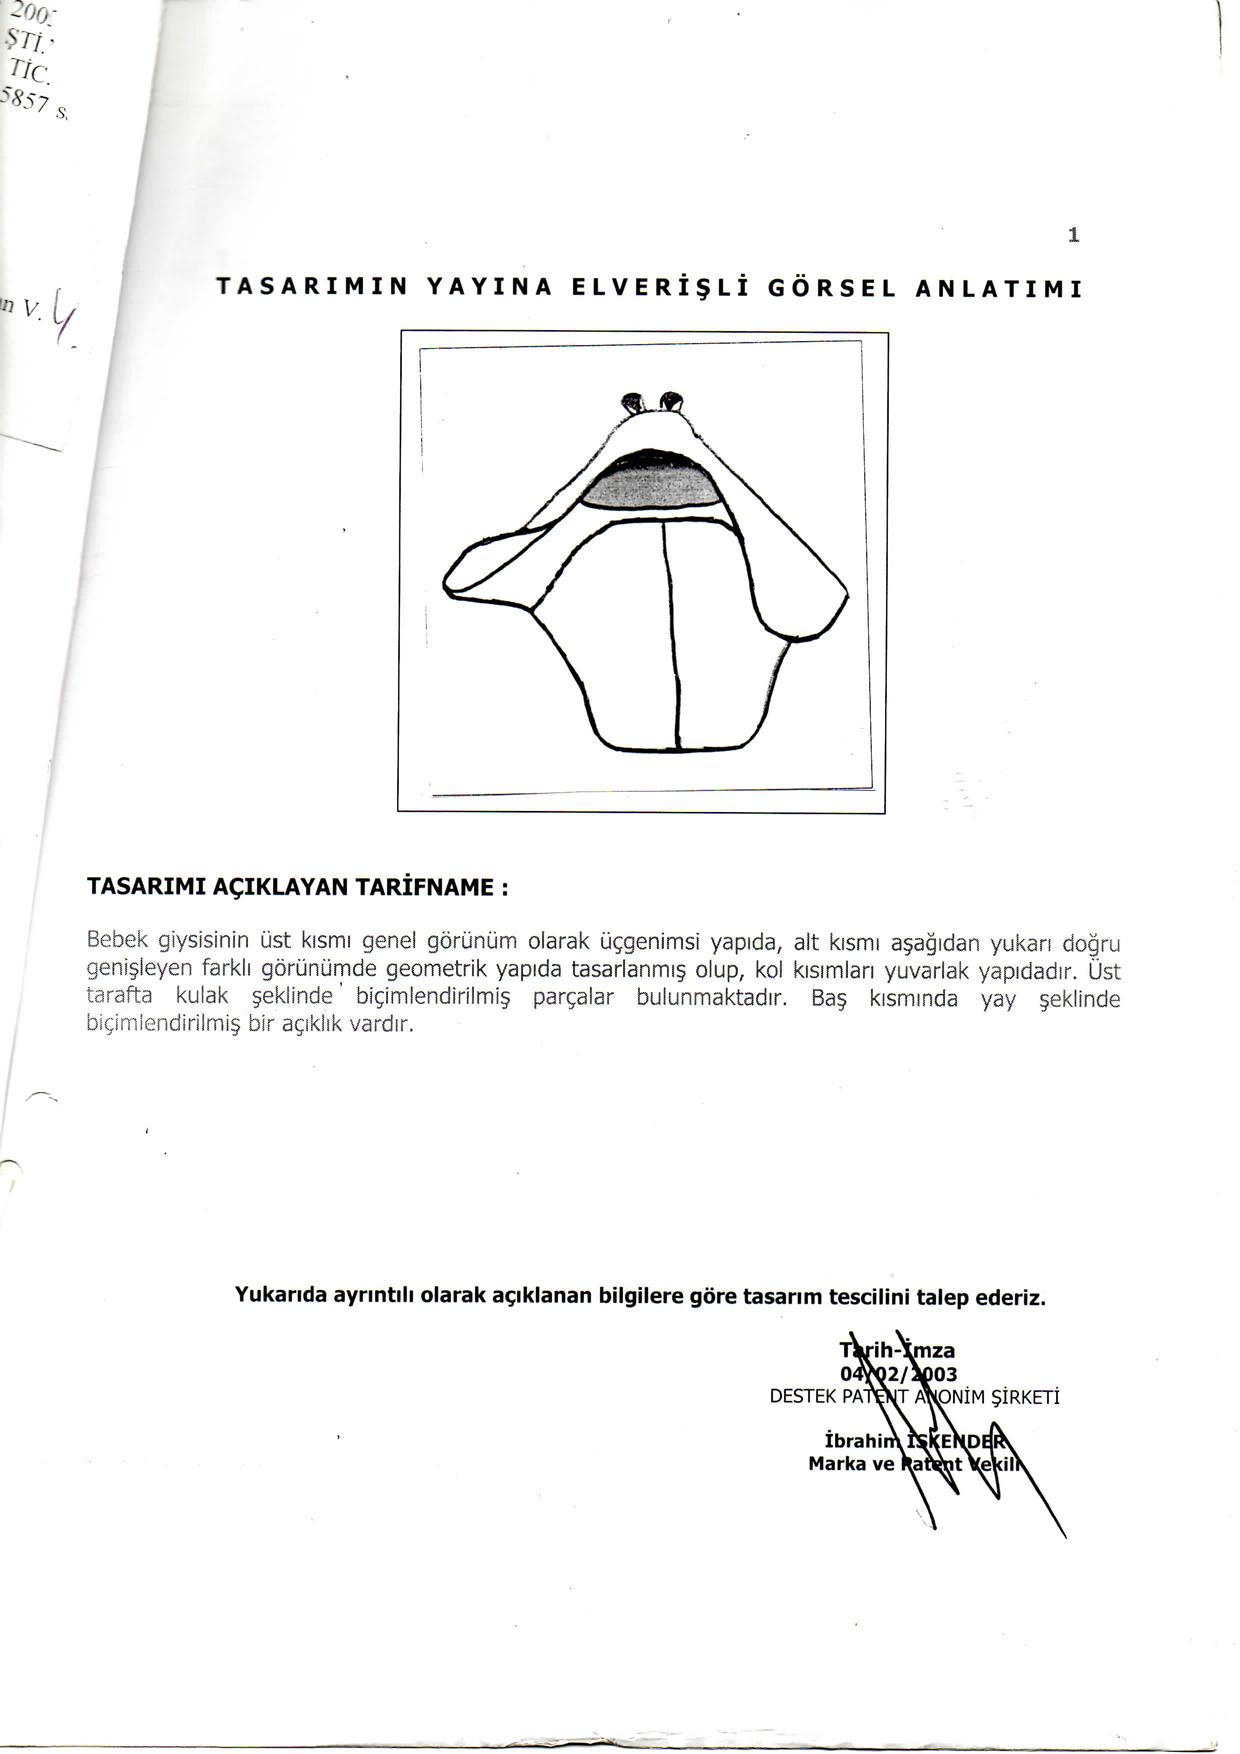 Kundak Havlu Patent 2